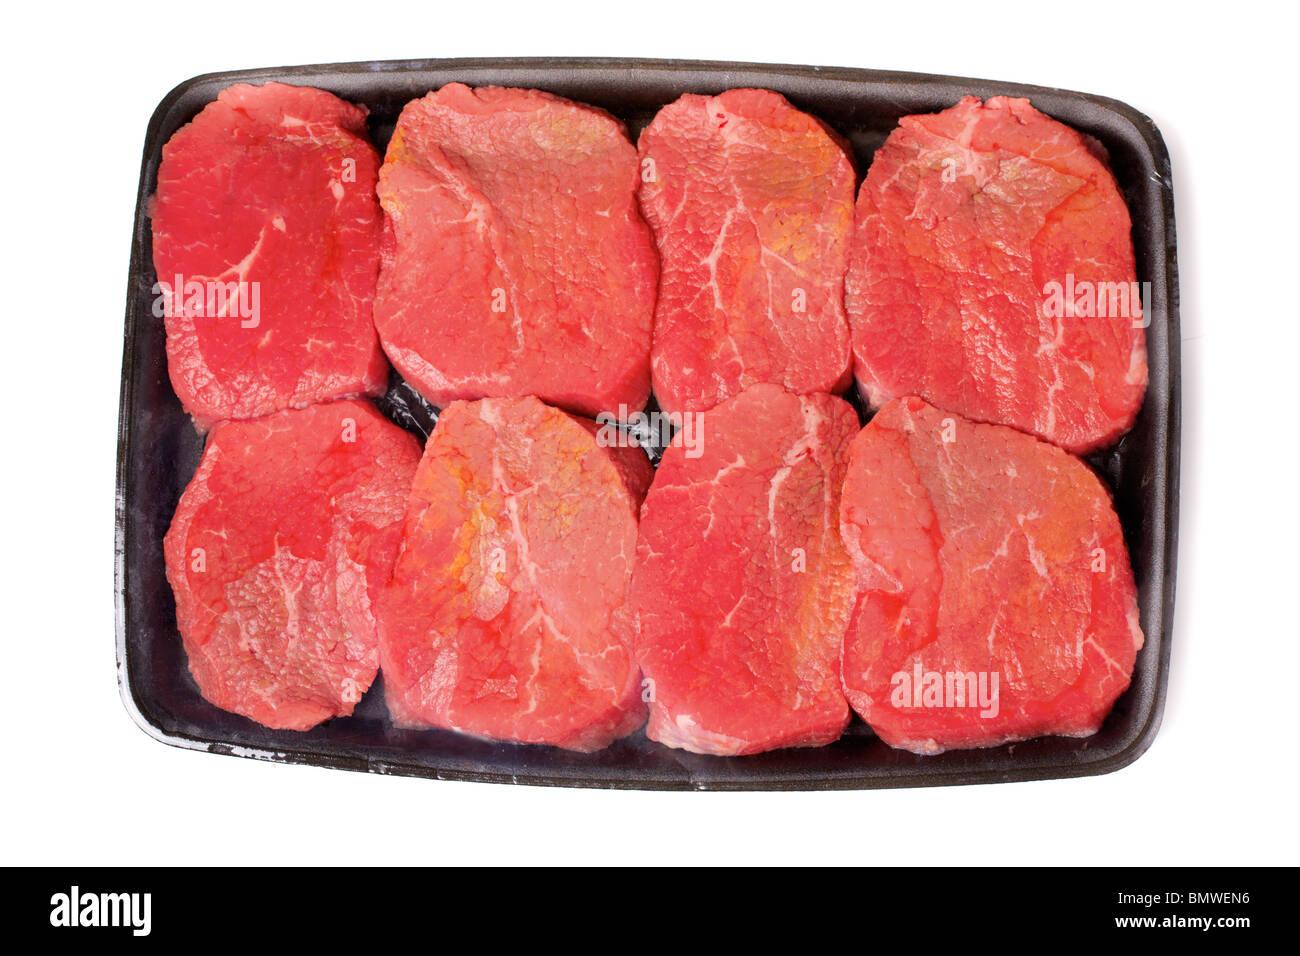 Package of steaks - Stock Image